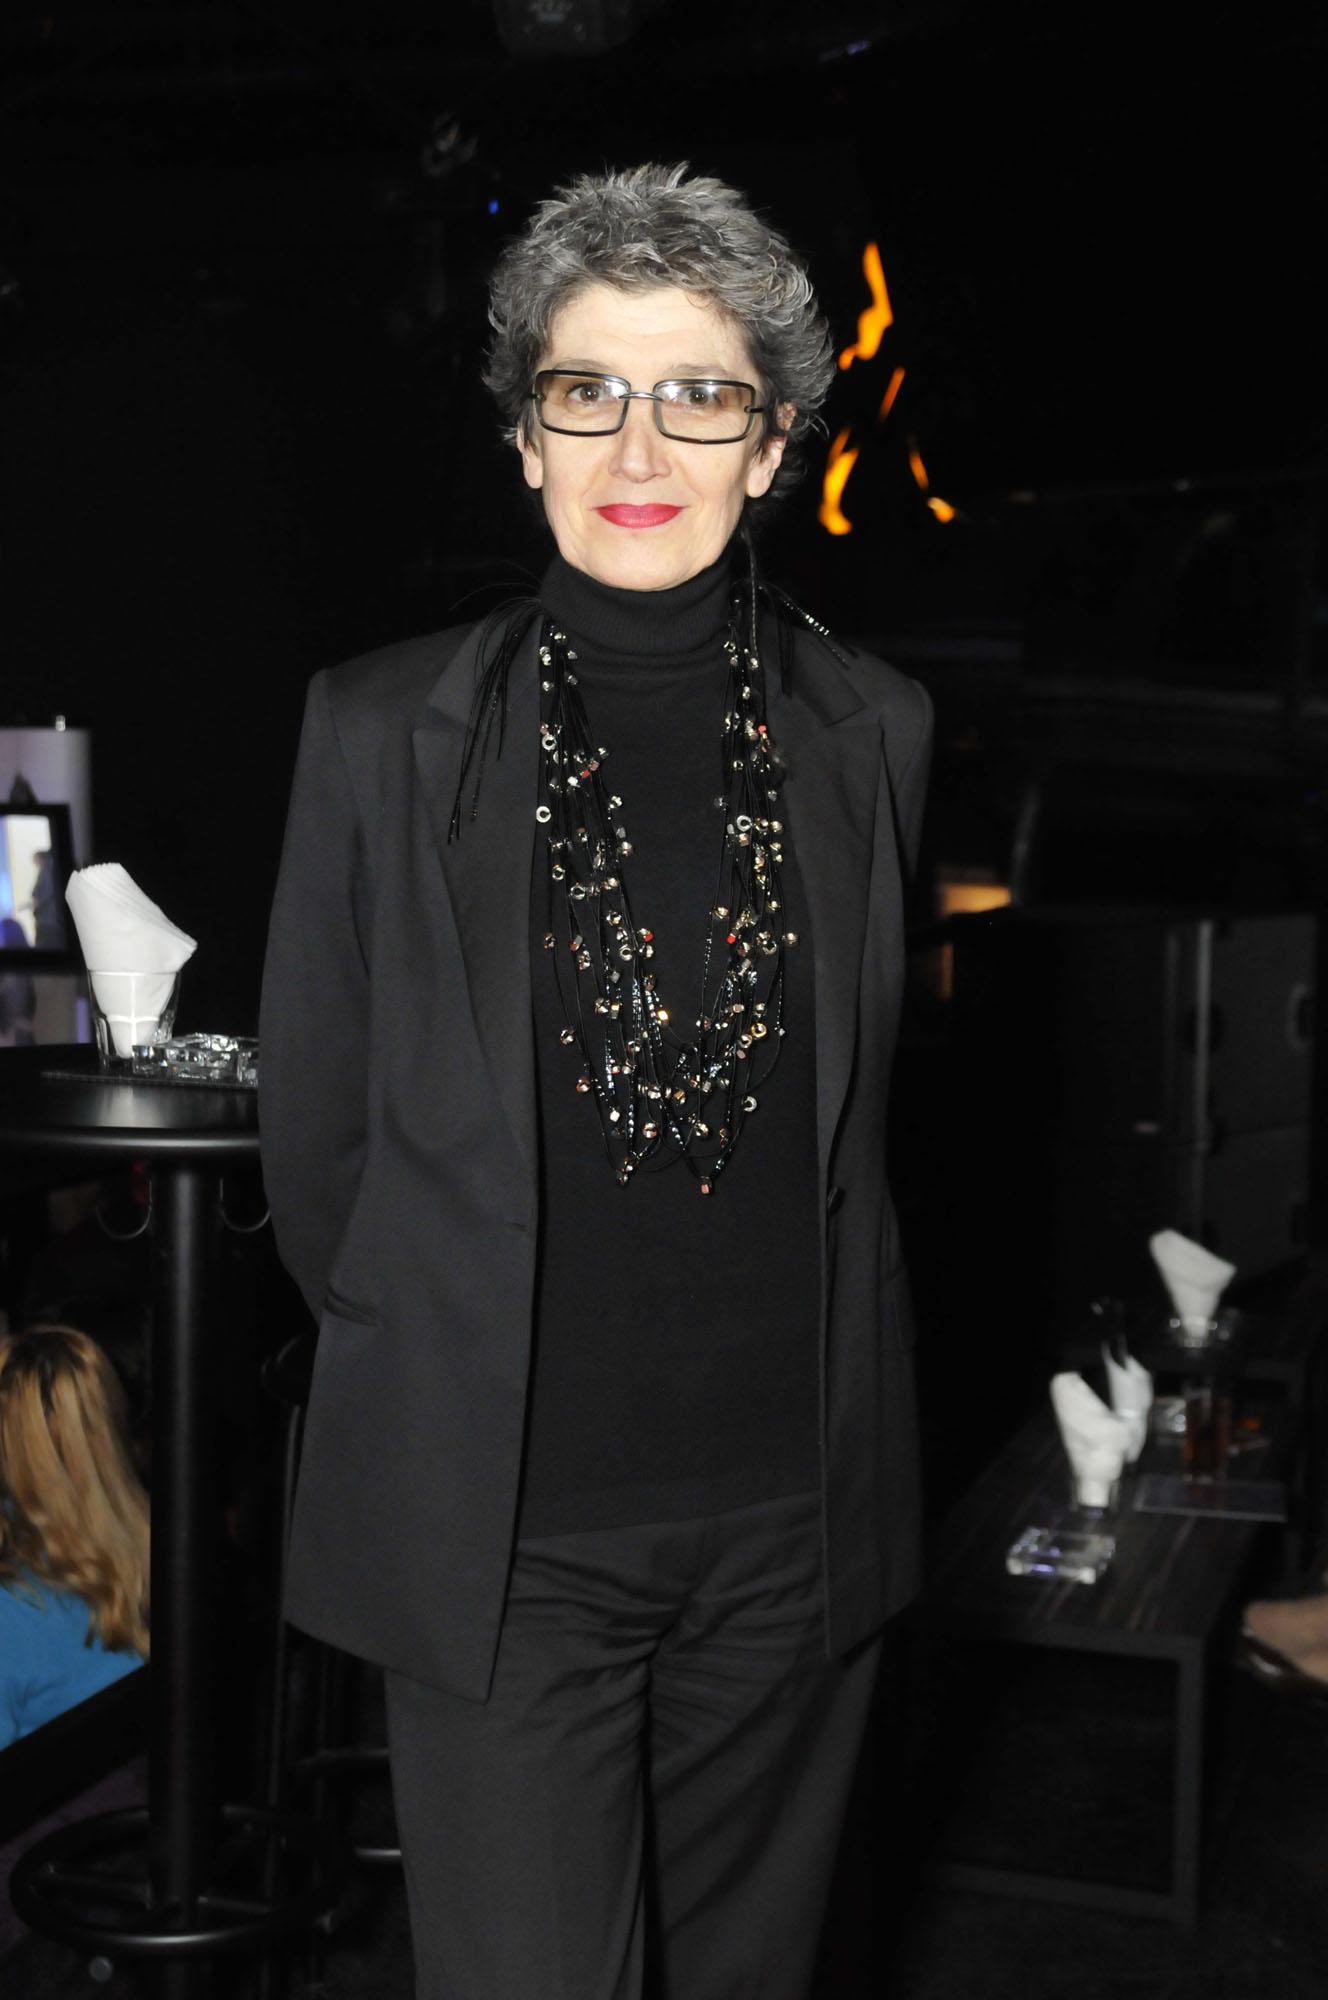 jasmina sanader Nagrade 30. Beogradske nedelje mode